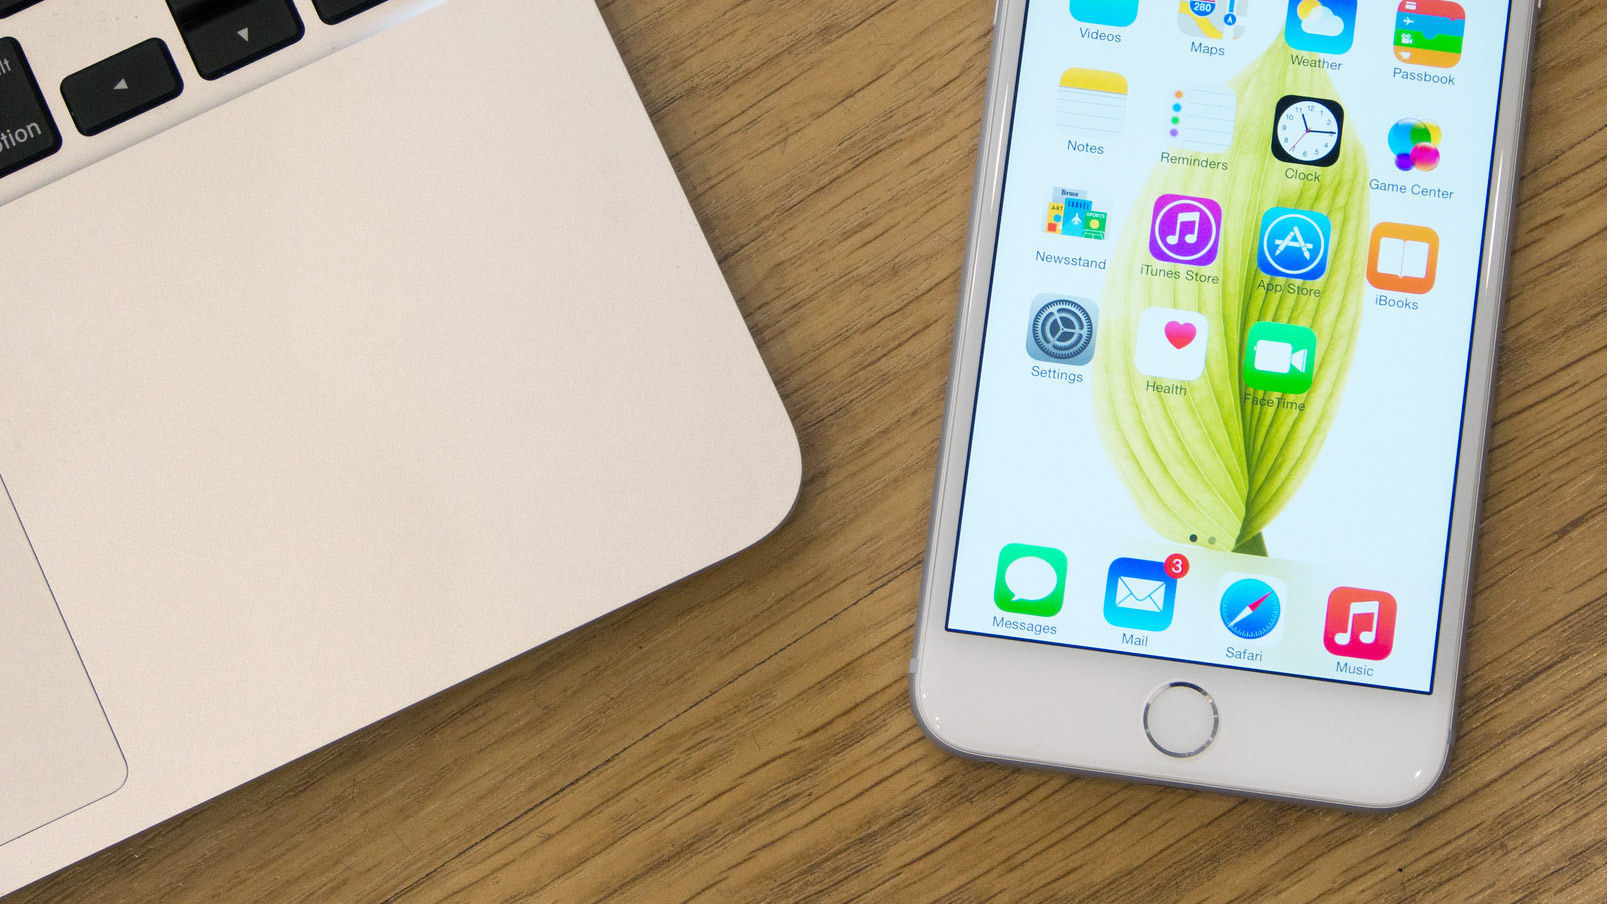 новый флагман apple 2017: смартфон